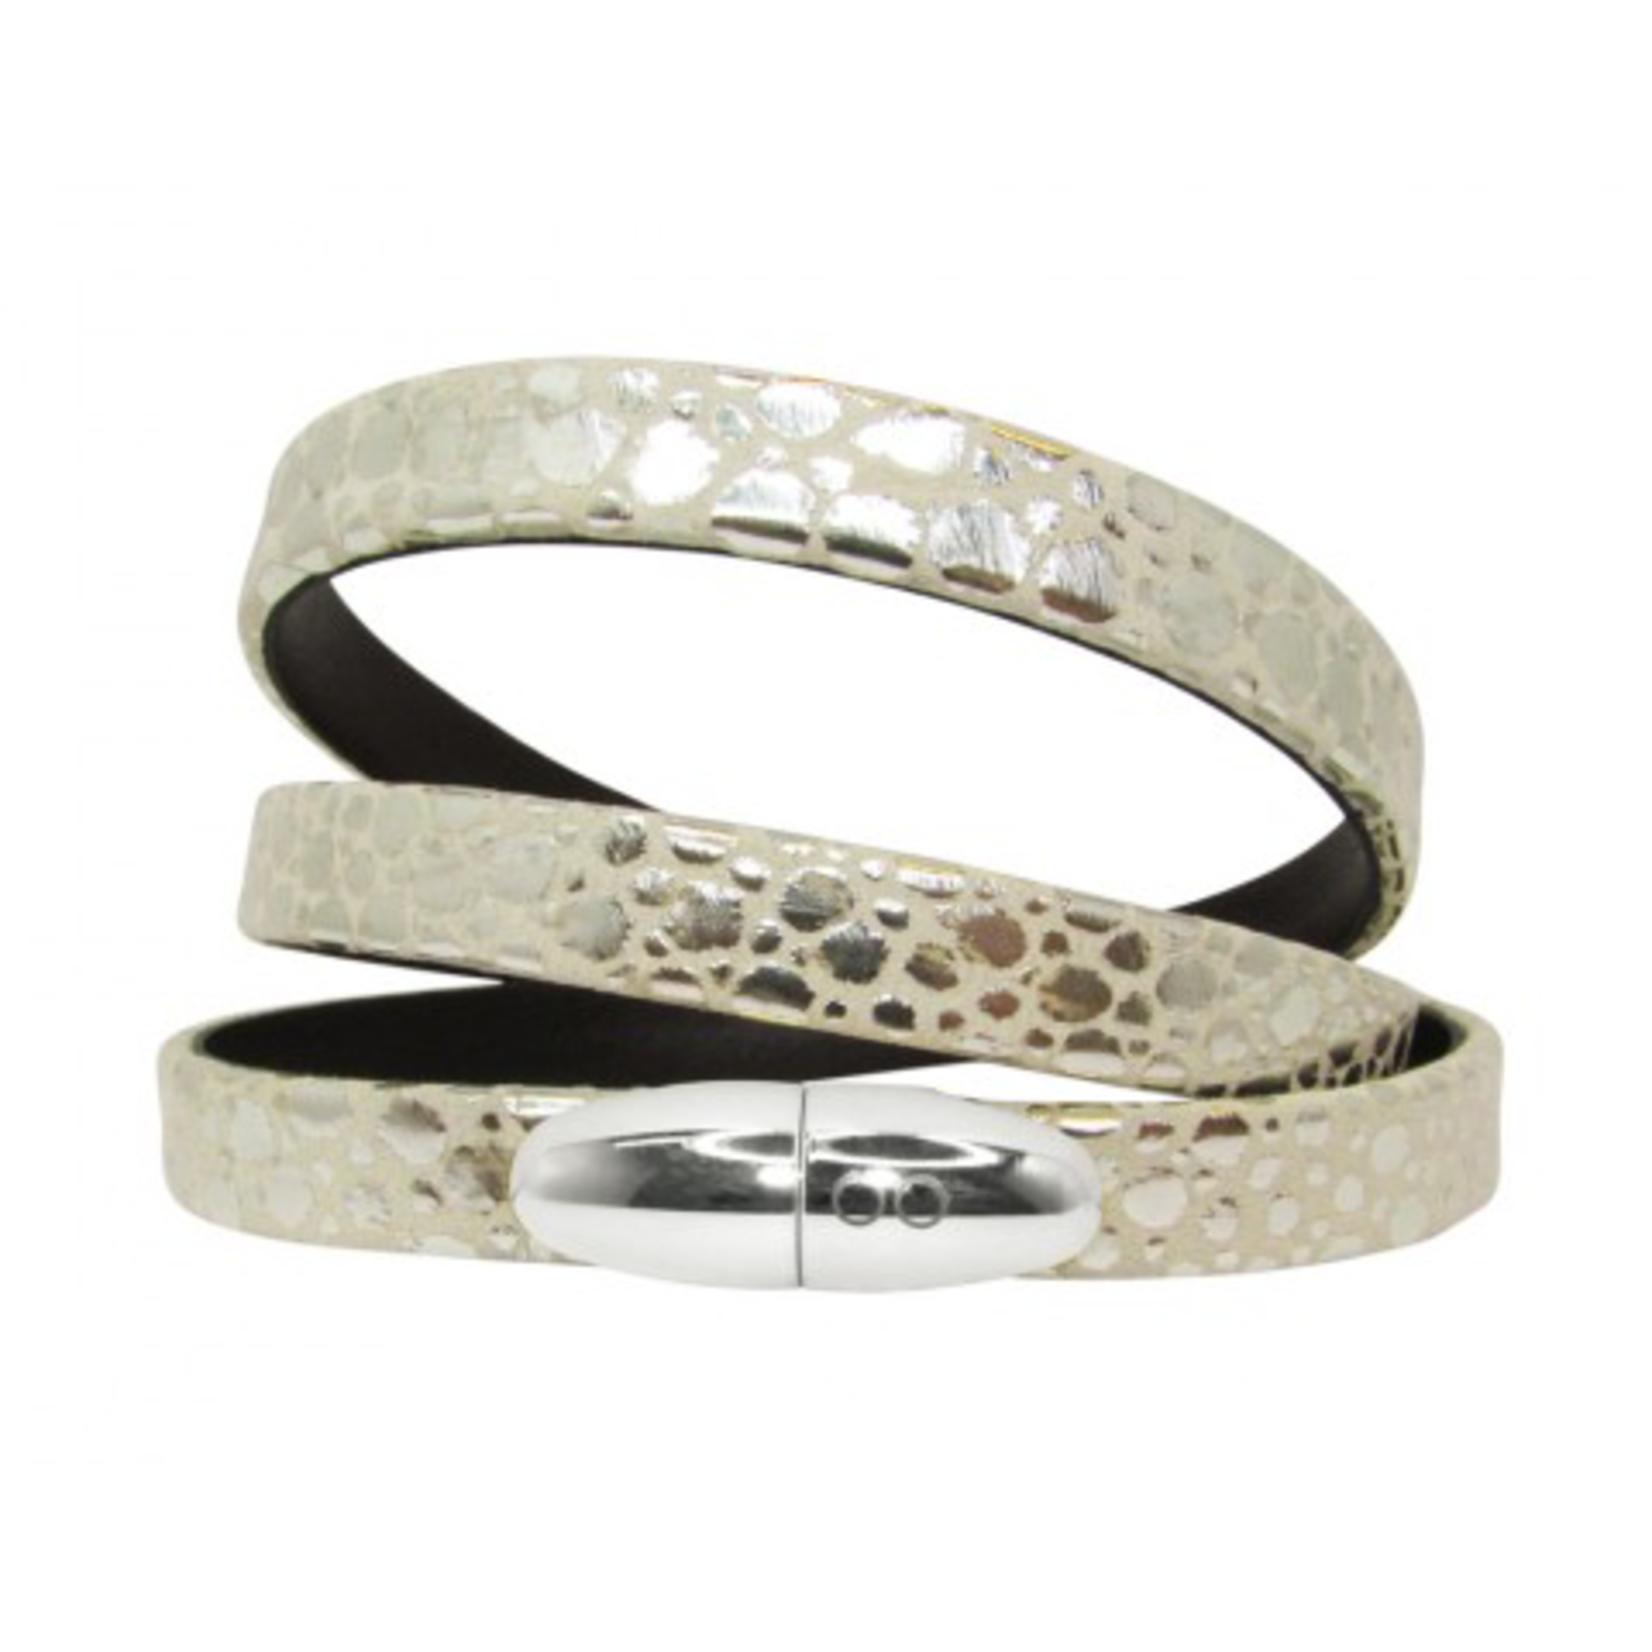 Antonio Ben Chimol Antonio Ben Chimol Stardust leather bracelet